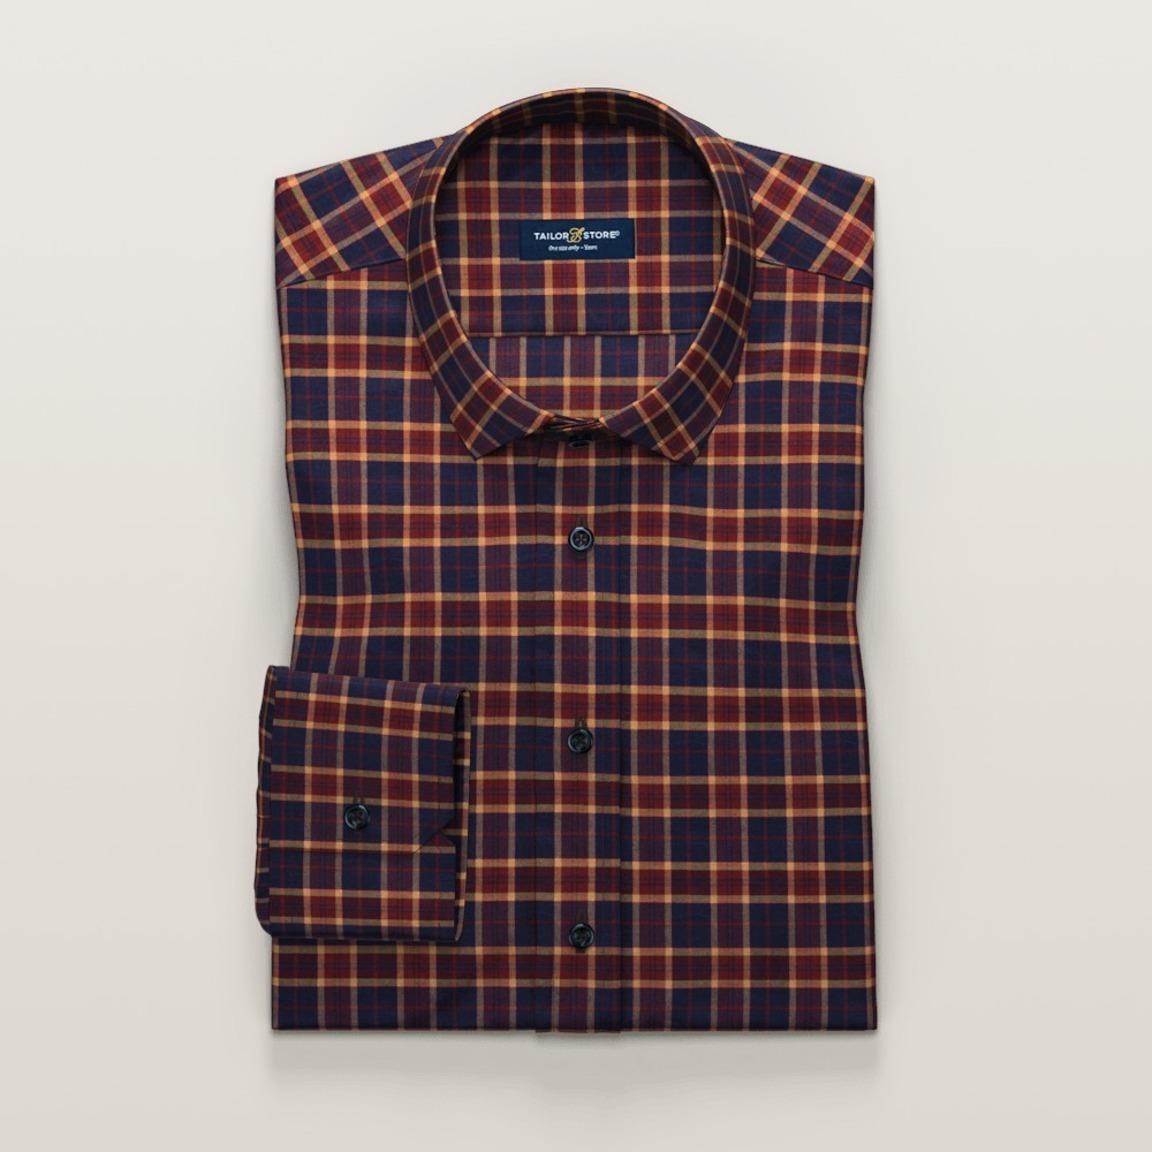 Blaues Twill-Hemd mit Karomuster